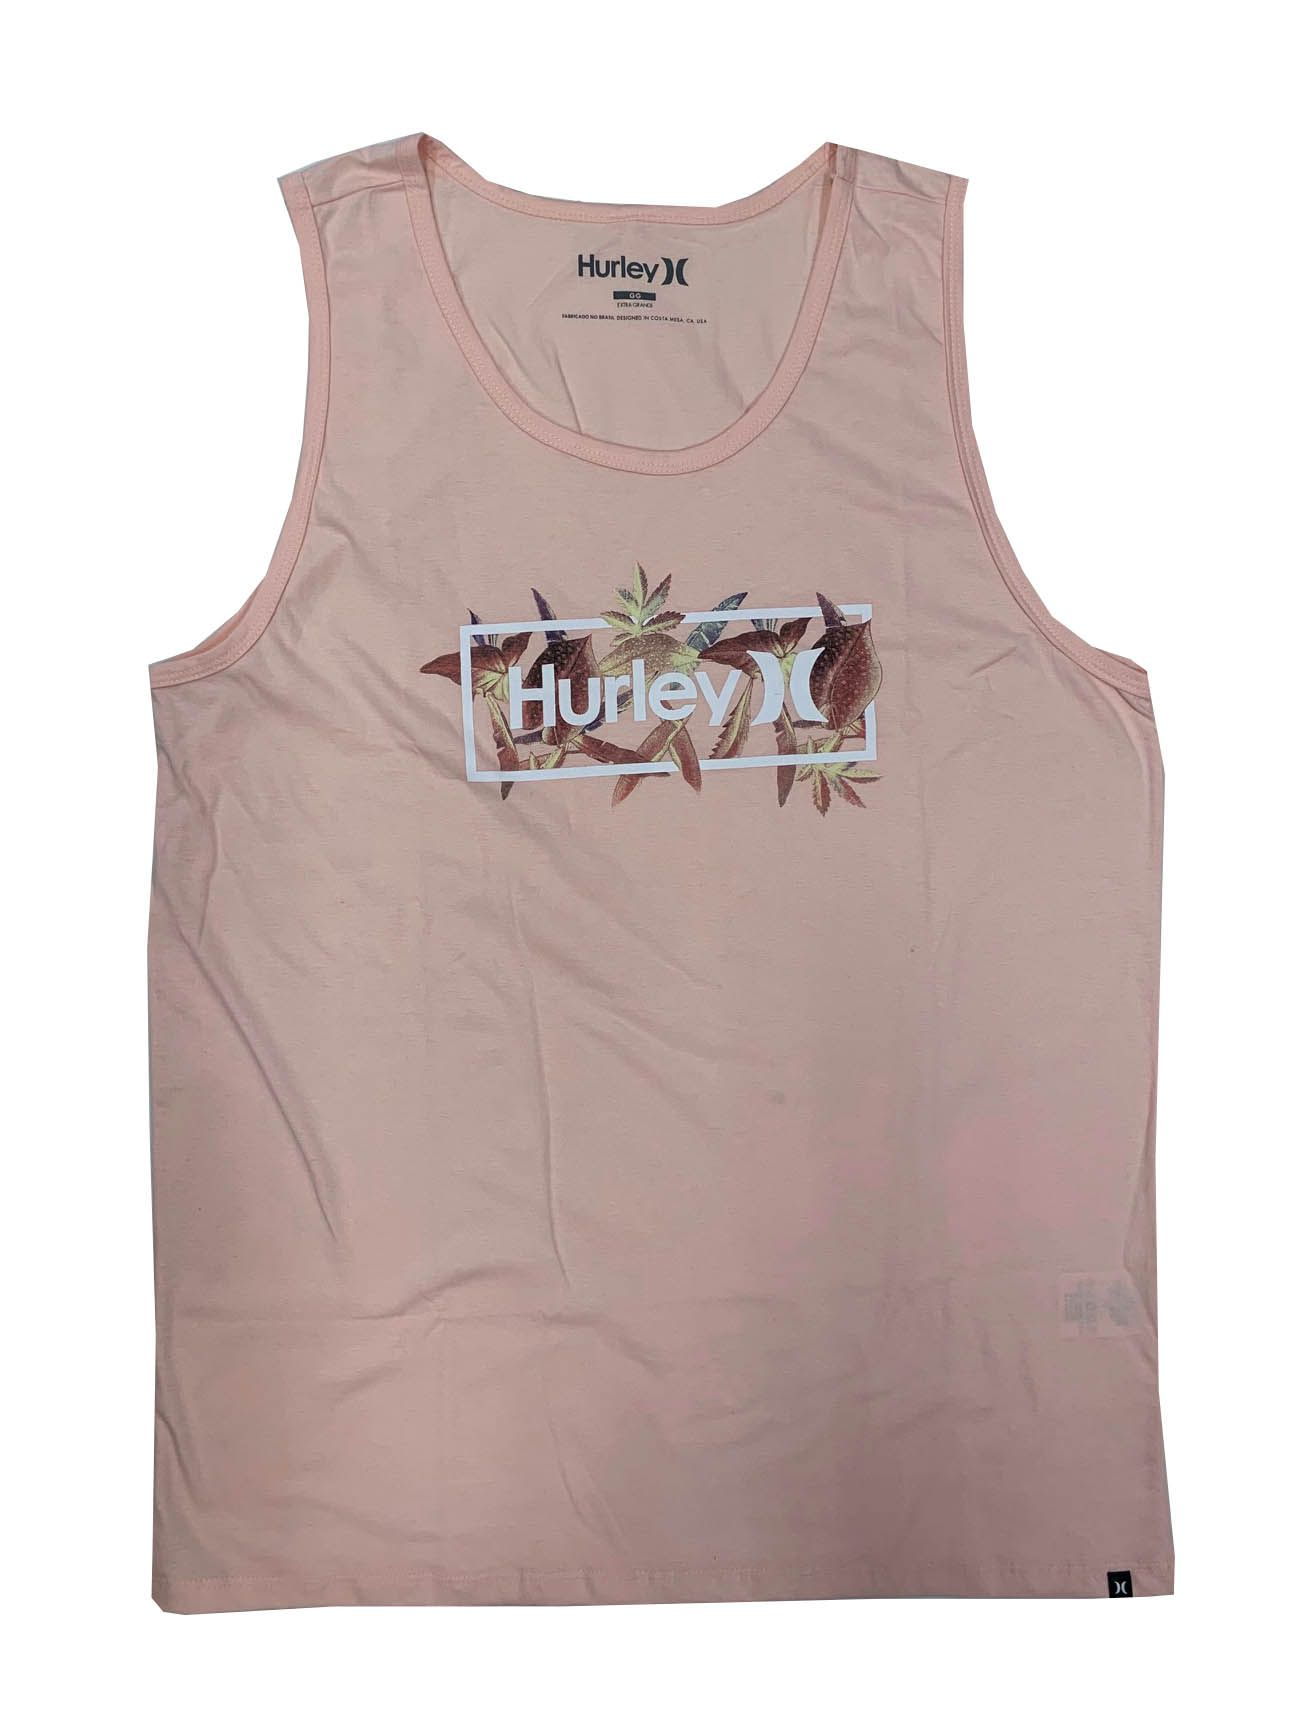 Regata Hurley 639091 masculina 39091